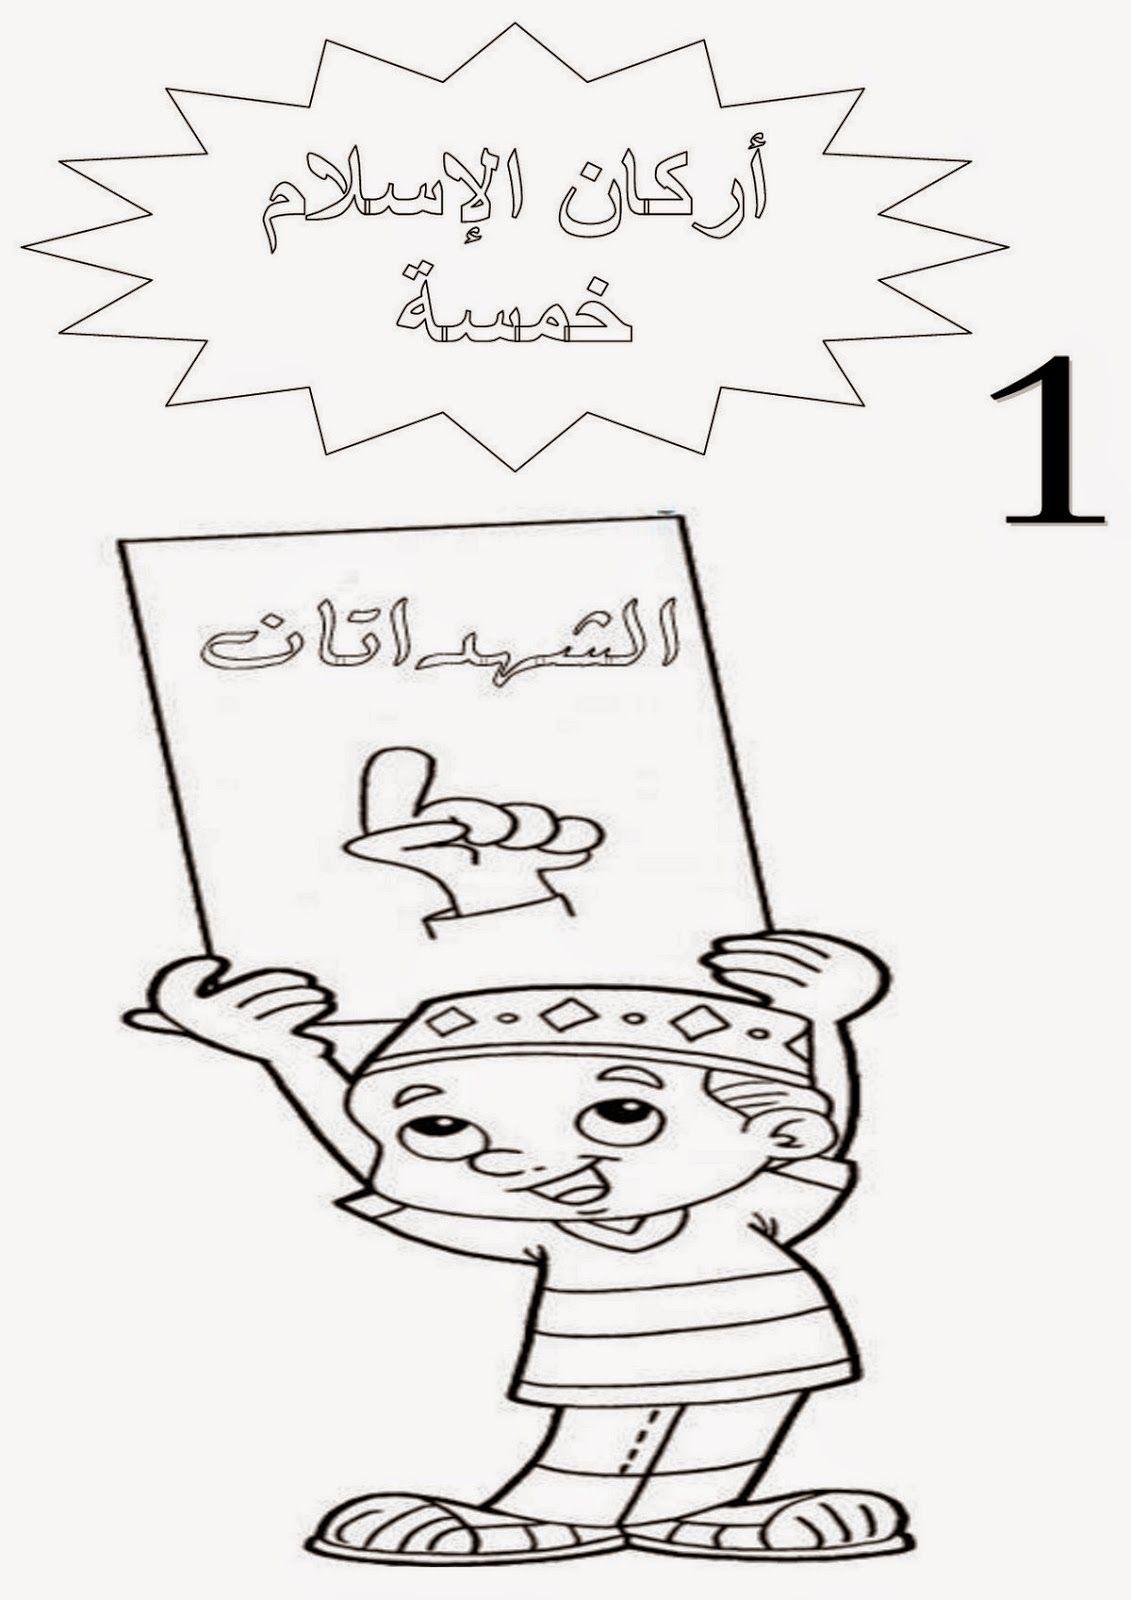 مدرستك بطاقات أركان الإسلام للتلوين رابط التحميل Pdf Islamic Kids Activities Islam For Kids Muslim Kids Activities